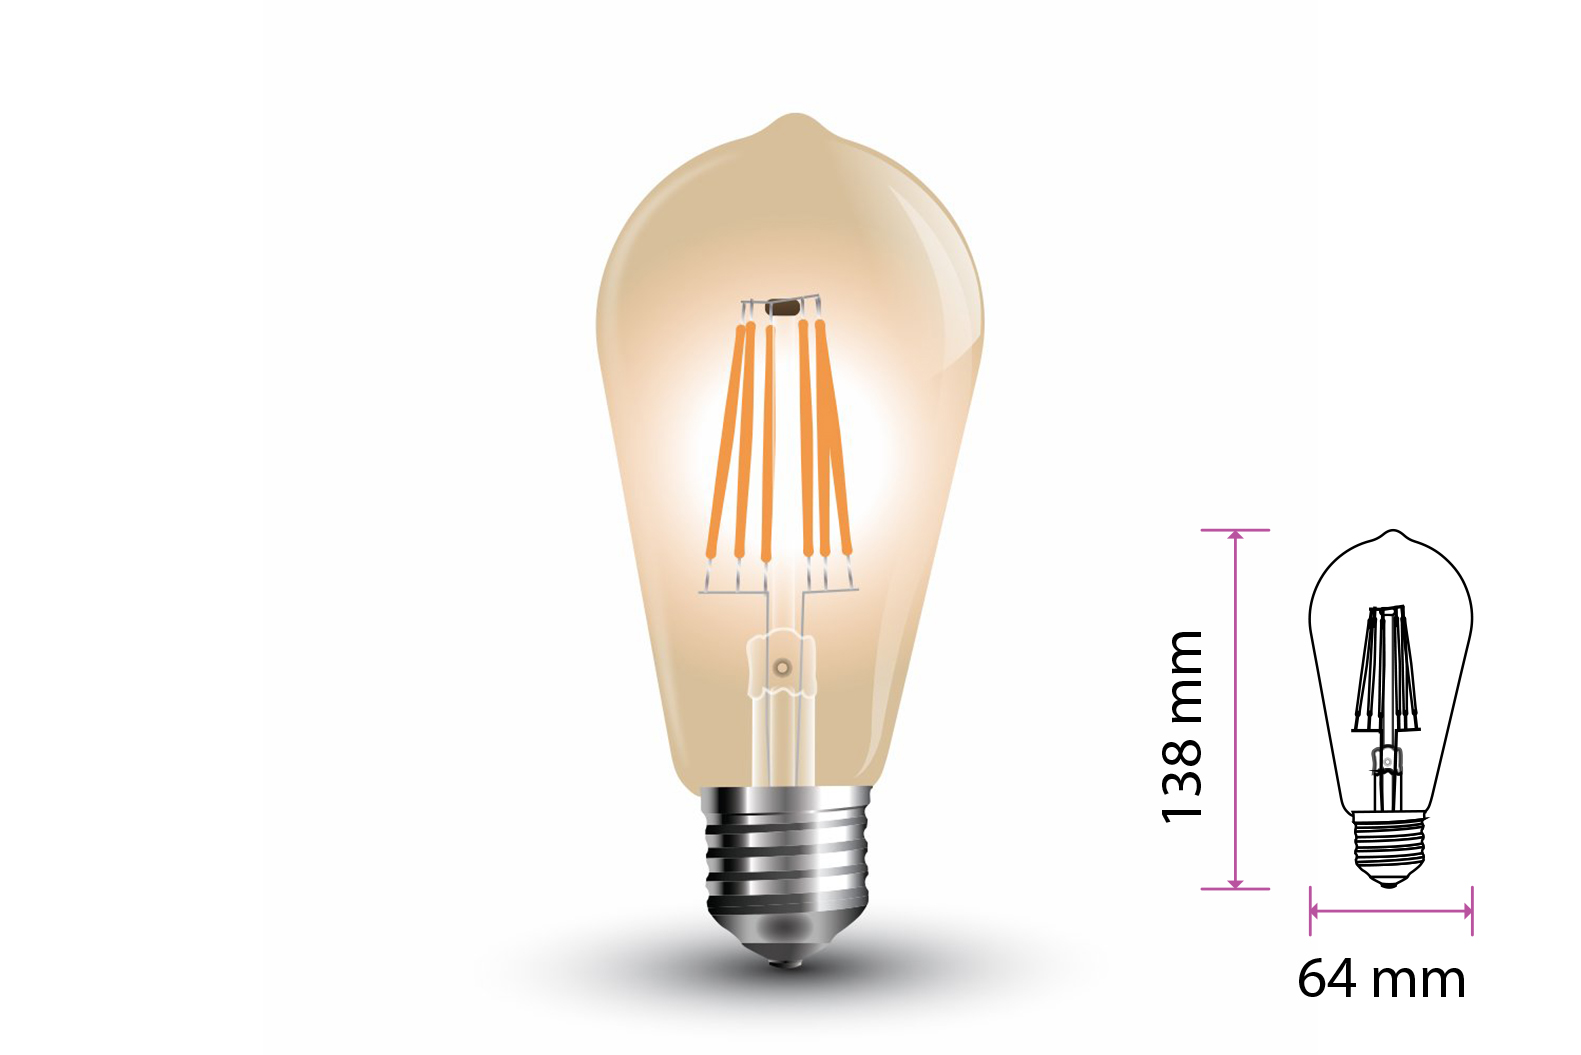 Lampada Filo Led a Filamento E27 ST64 6W Bianco Caldo 2200K Cover Amber Vintage SKU-4362 - PZ